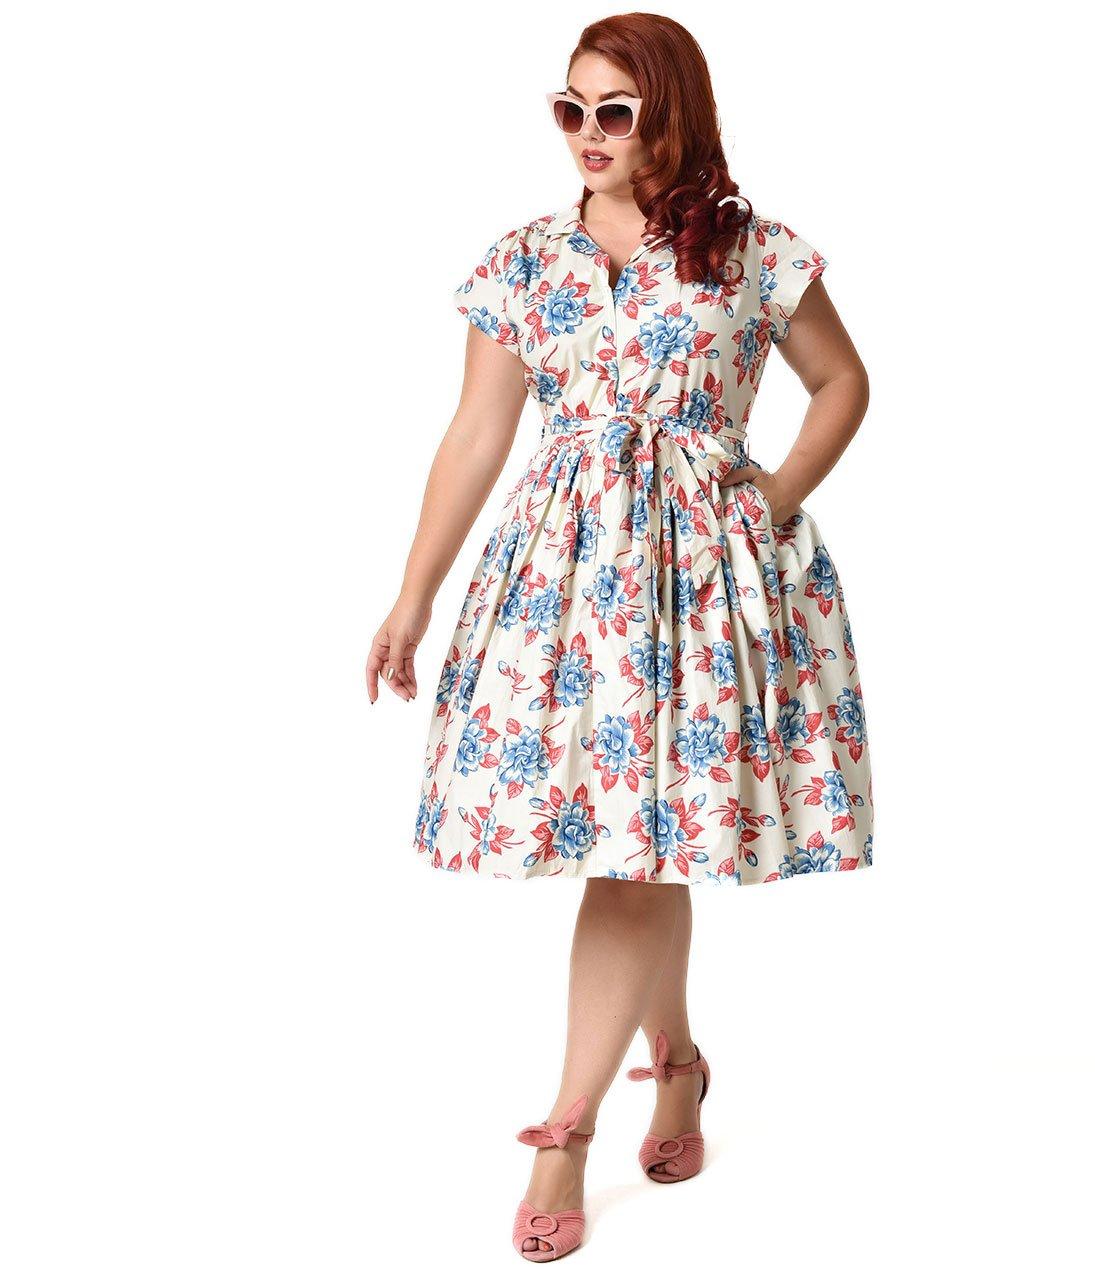 Bernie Dexter Plus Size 1950s Style Ivory Gardenia Floral Kelly Swing Dress by Unique Vintage